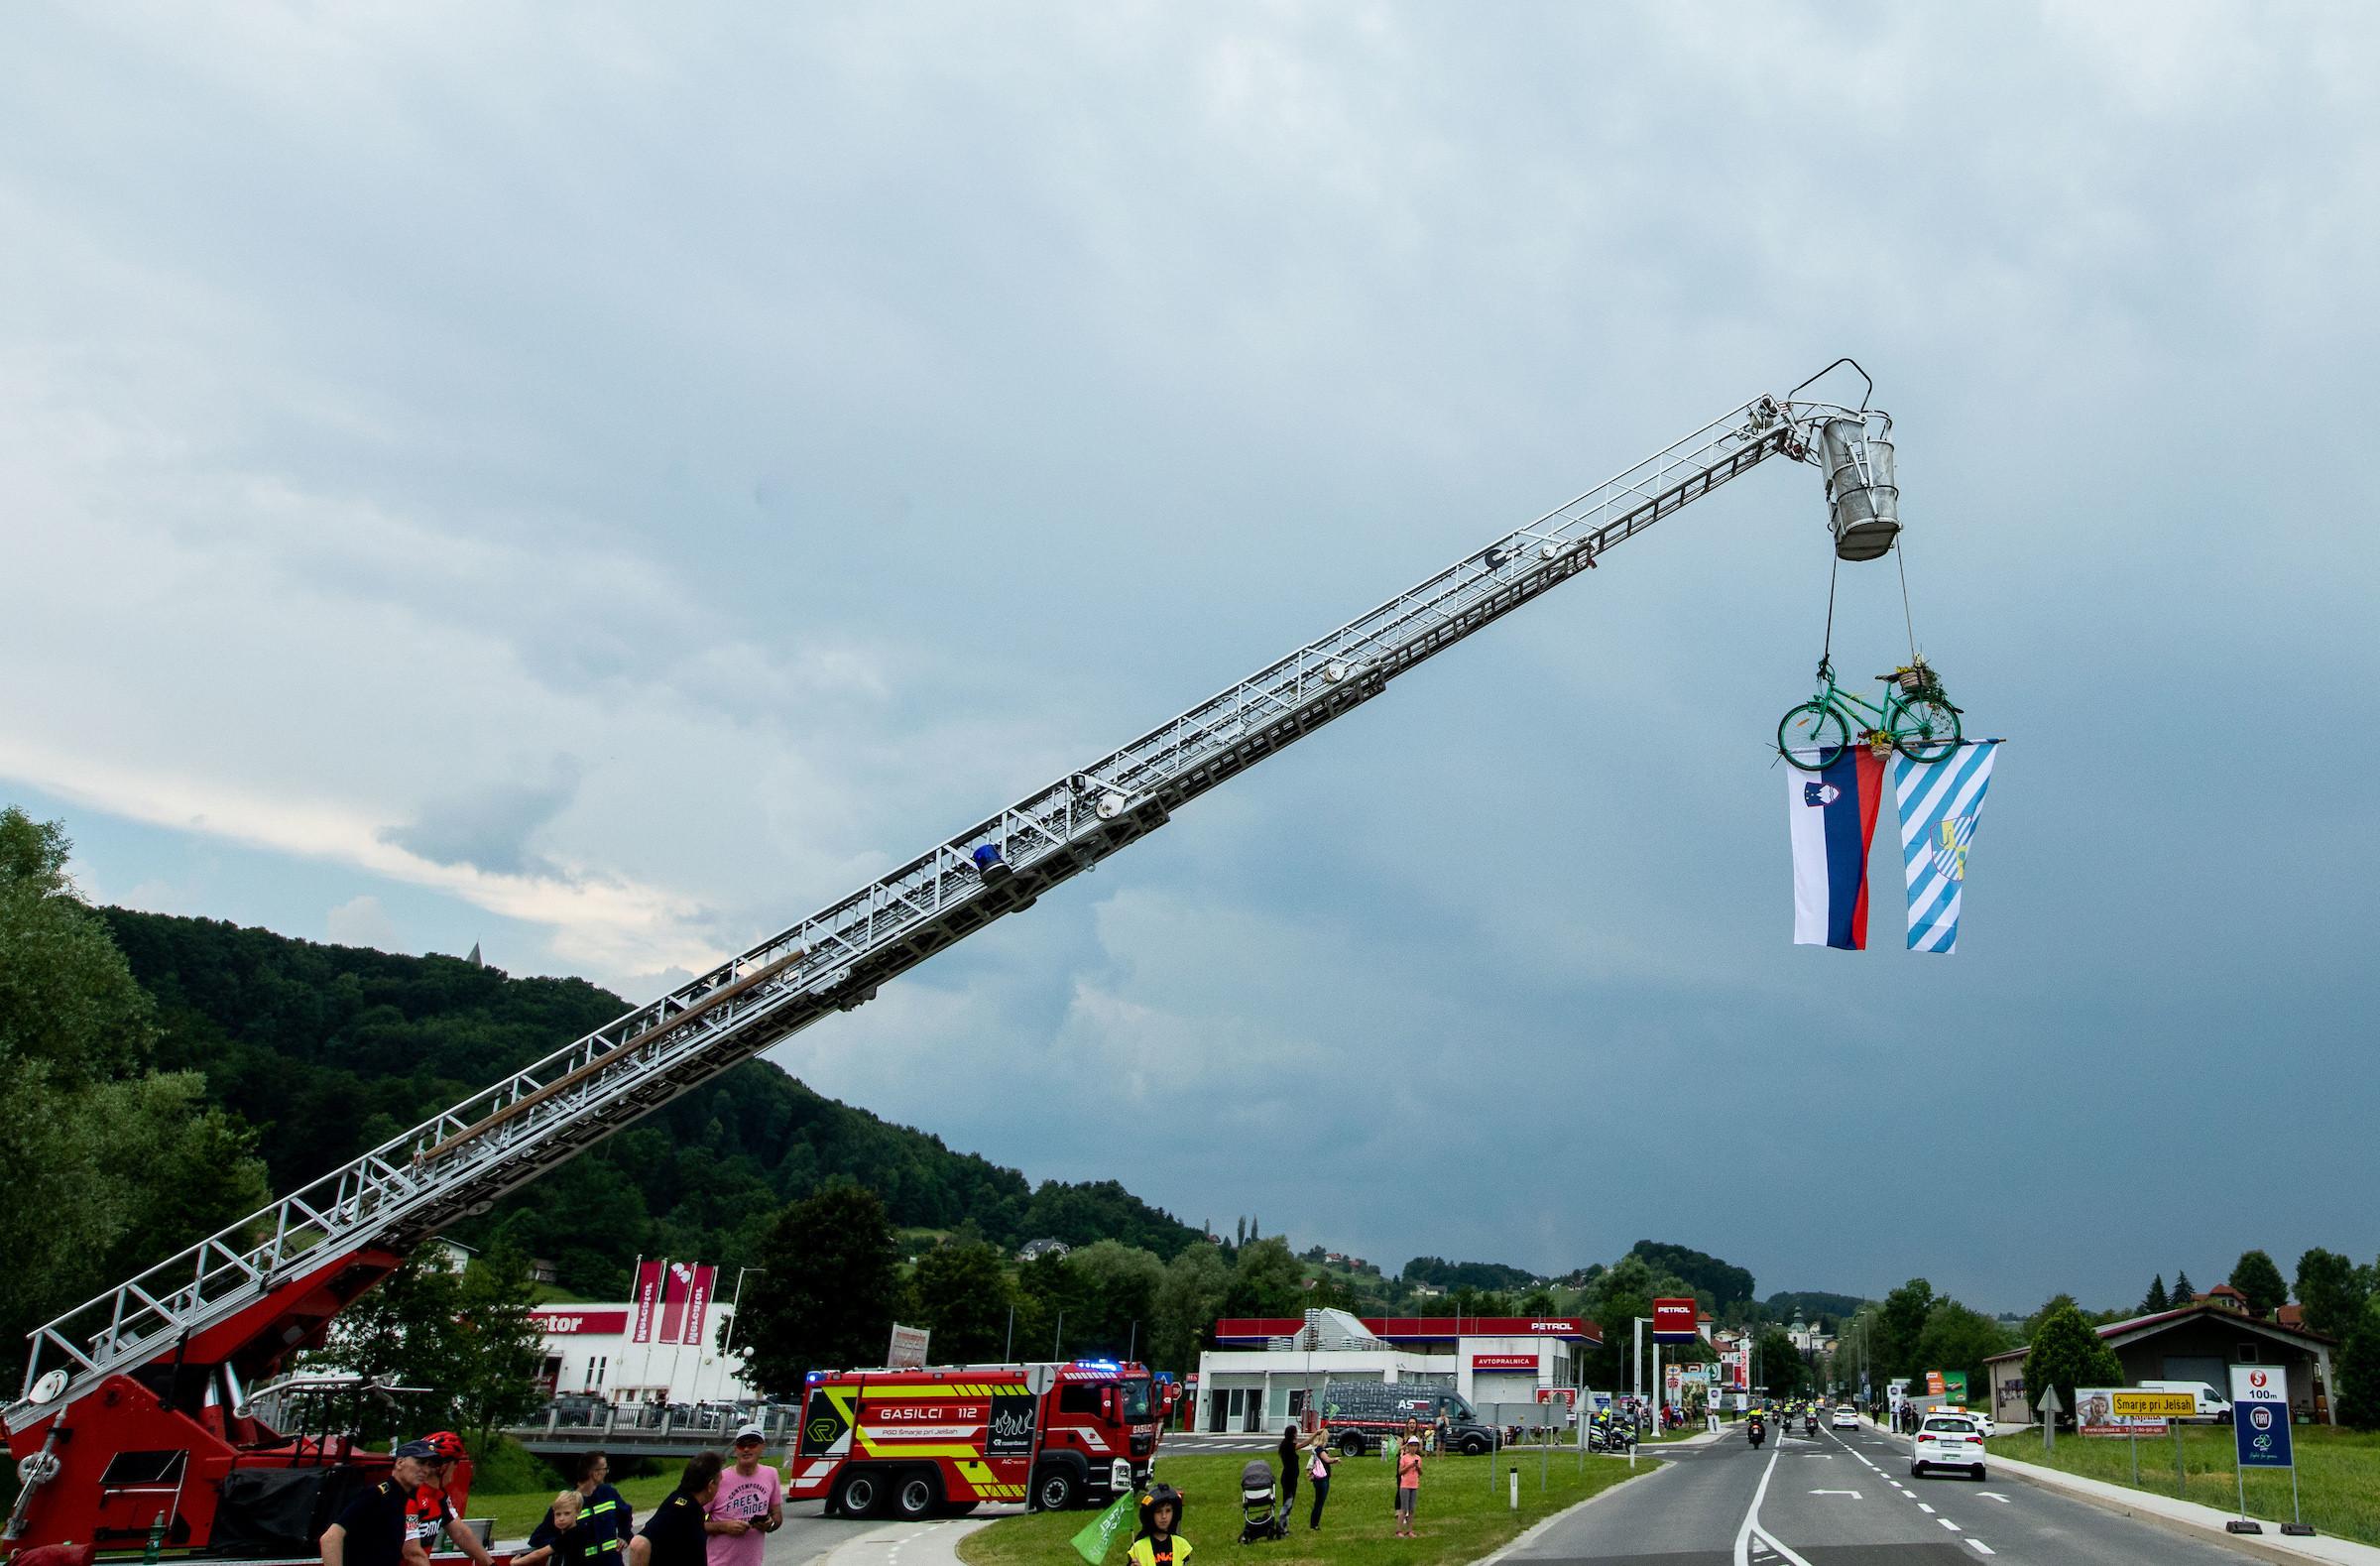 Zahvala gasilcem in ostalim prostovoljcem